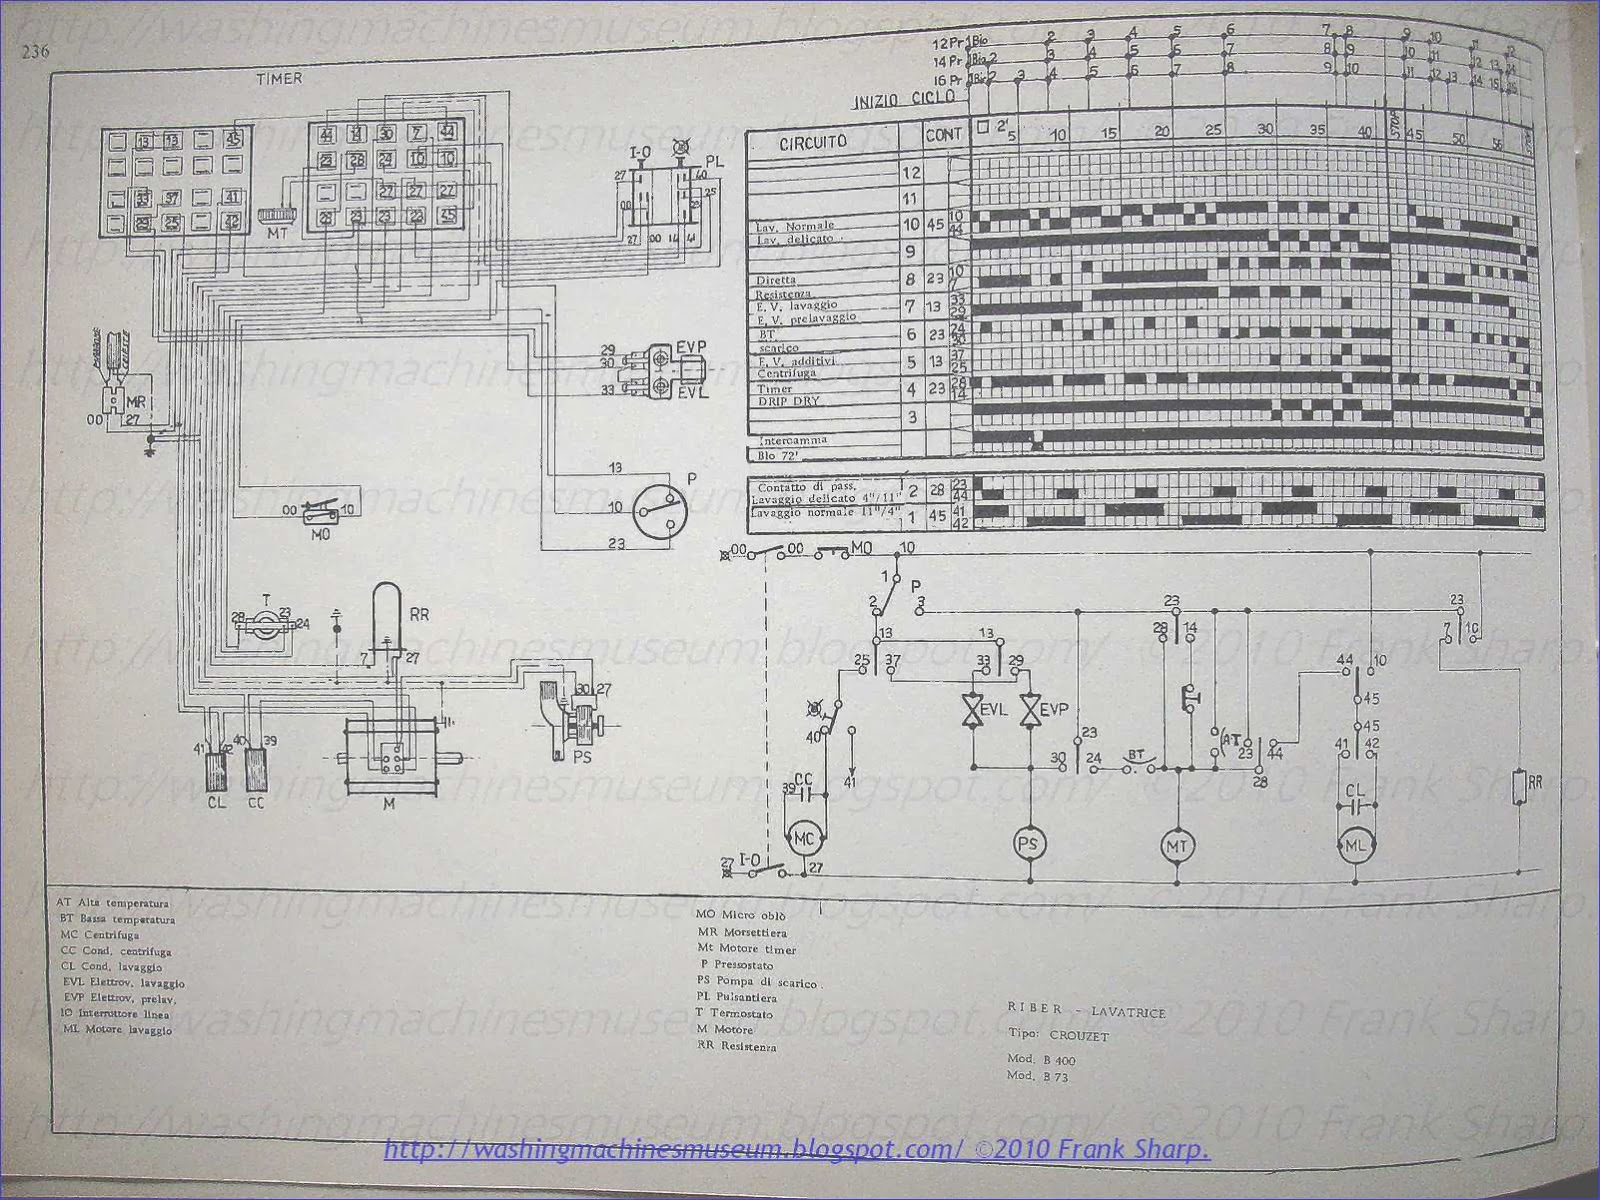 Wash Machine Motor Wiring Schematic Manual Of Diagram Crouzet Timer 28 Images Washing Pdf